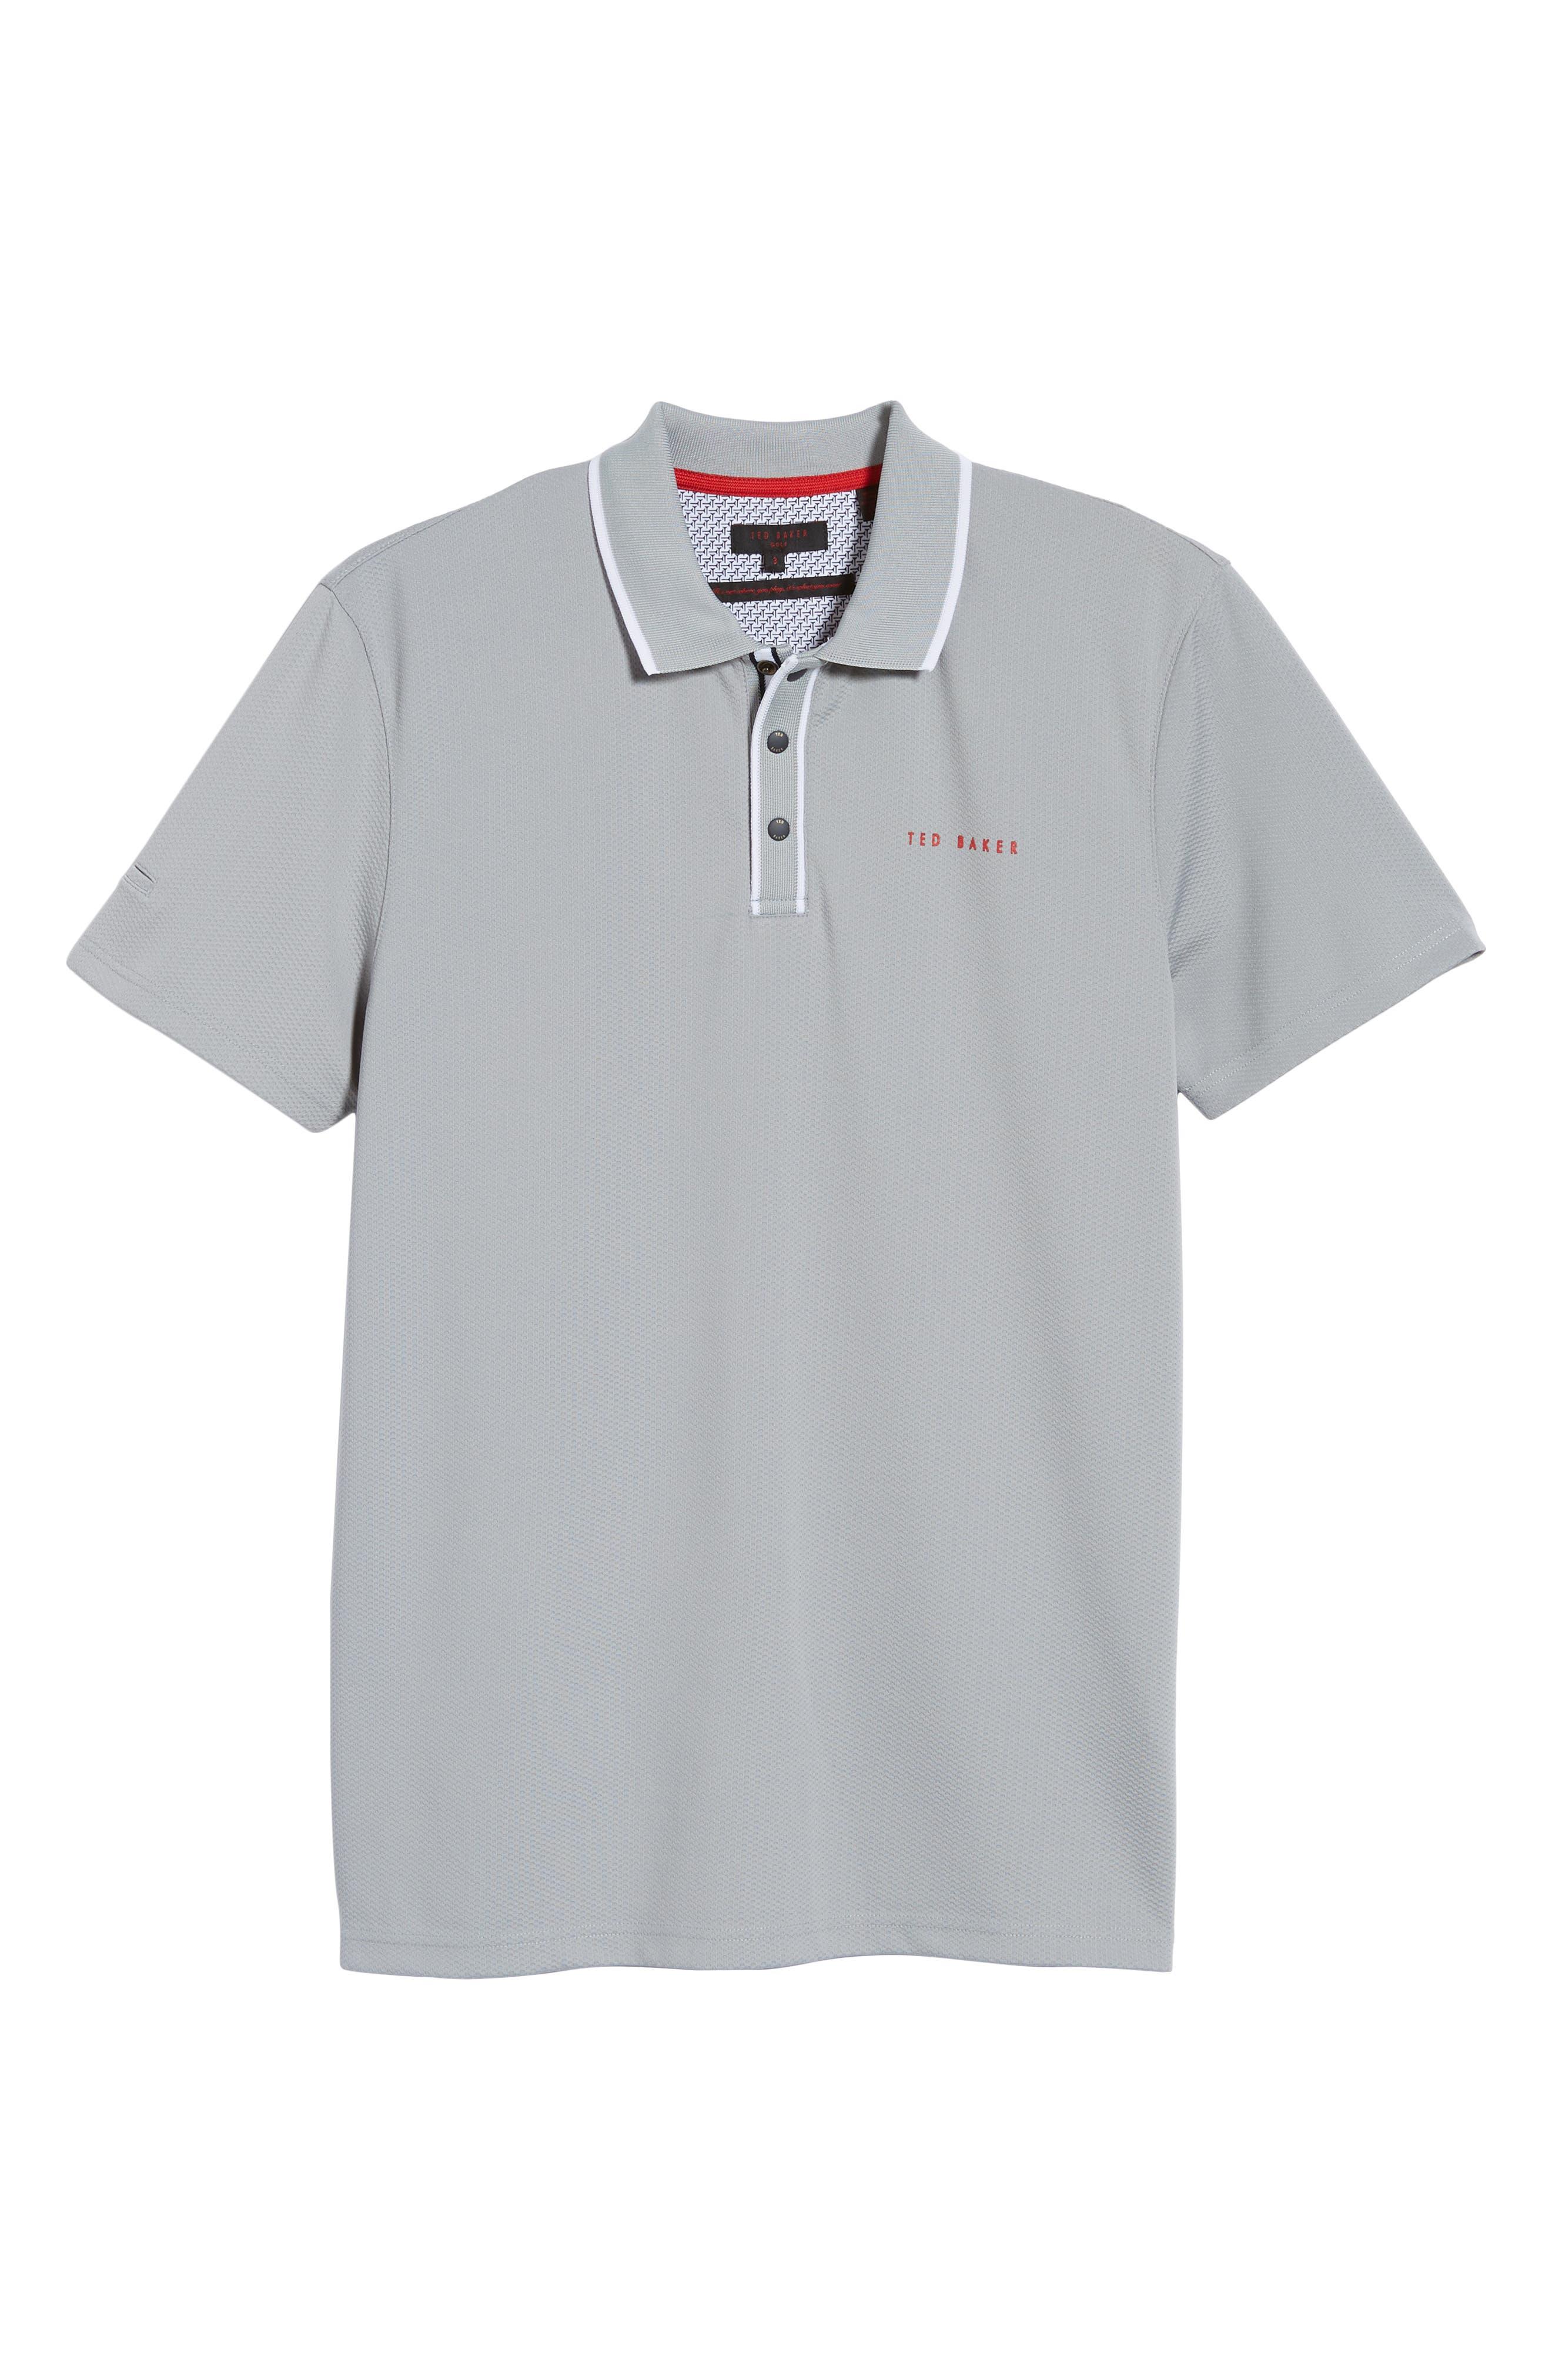 TED BAKER LONDON,                             Bunka Trim Fit Golf Polo,                             Alternate thumbnail 6, color,                             LT-GREY